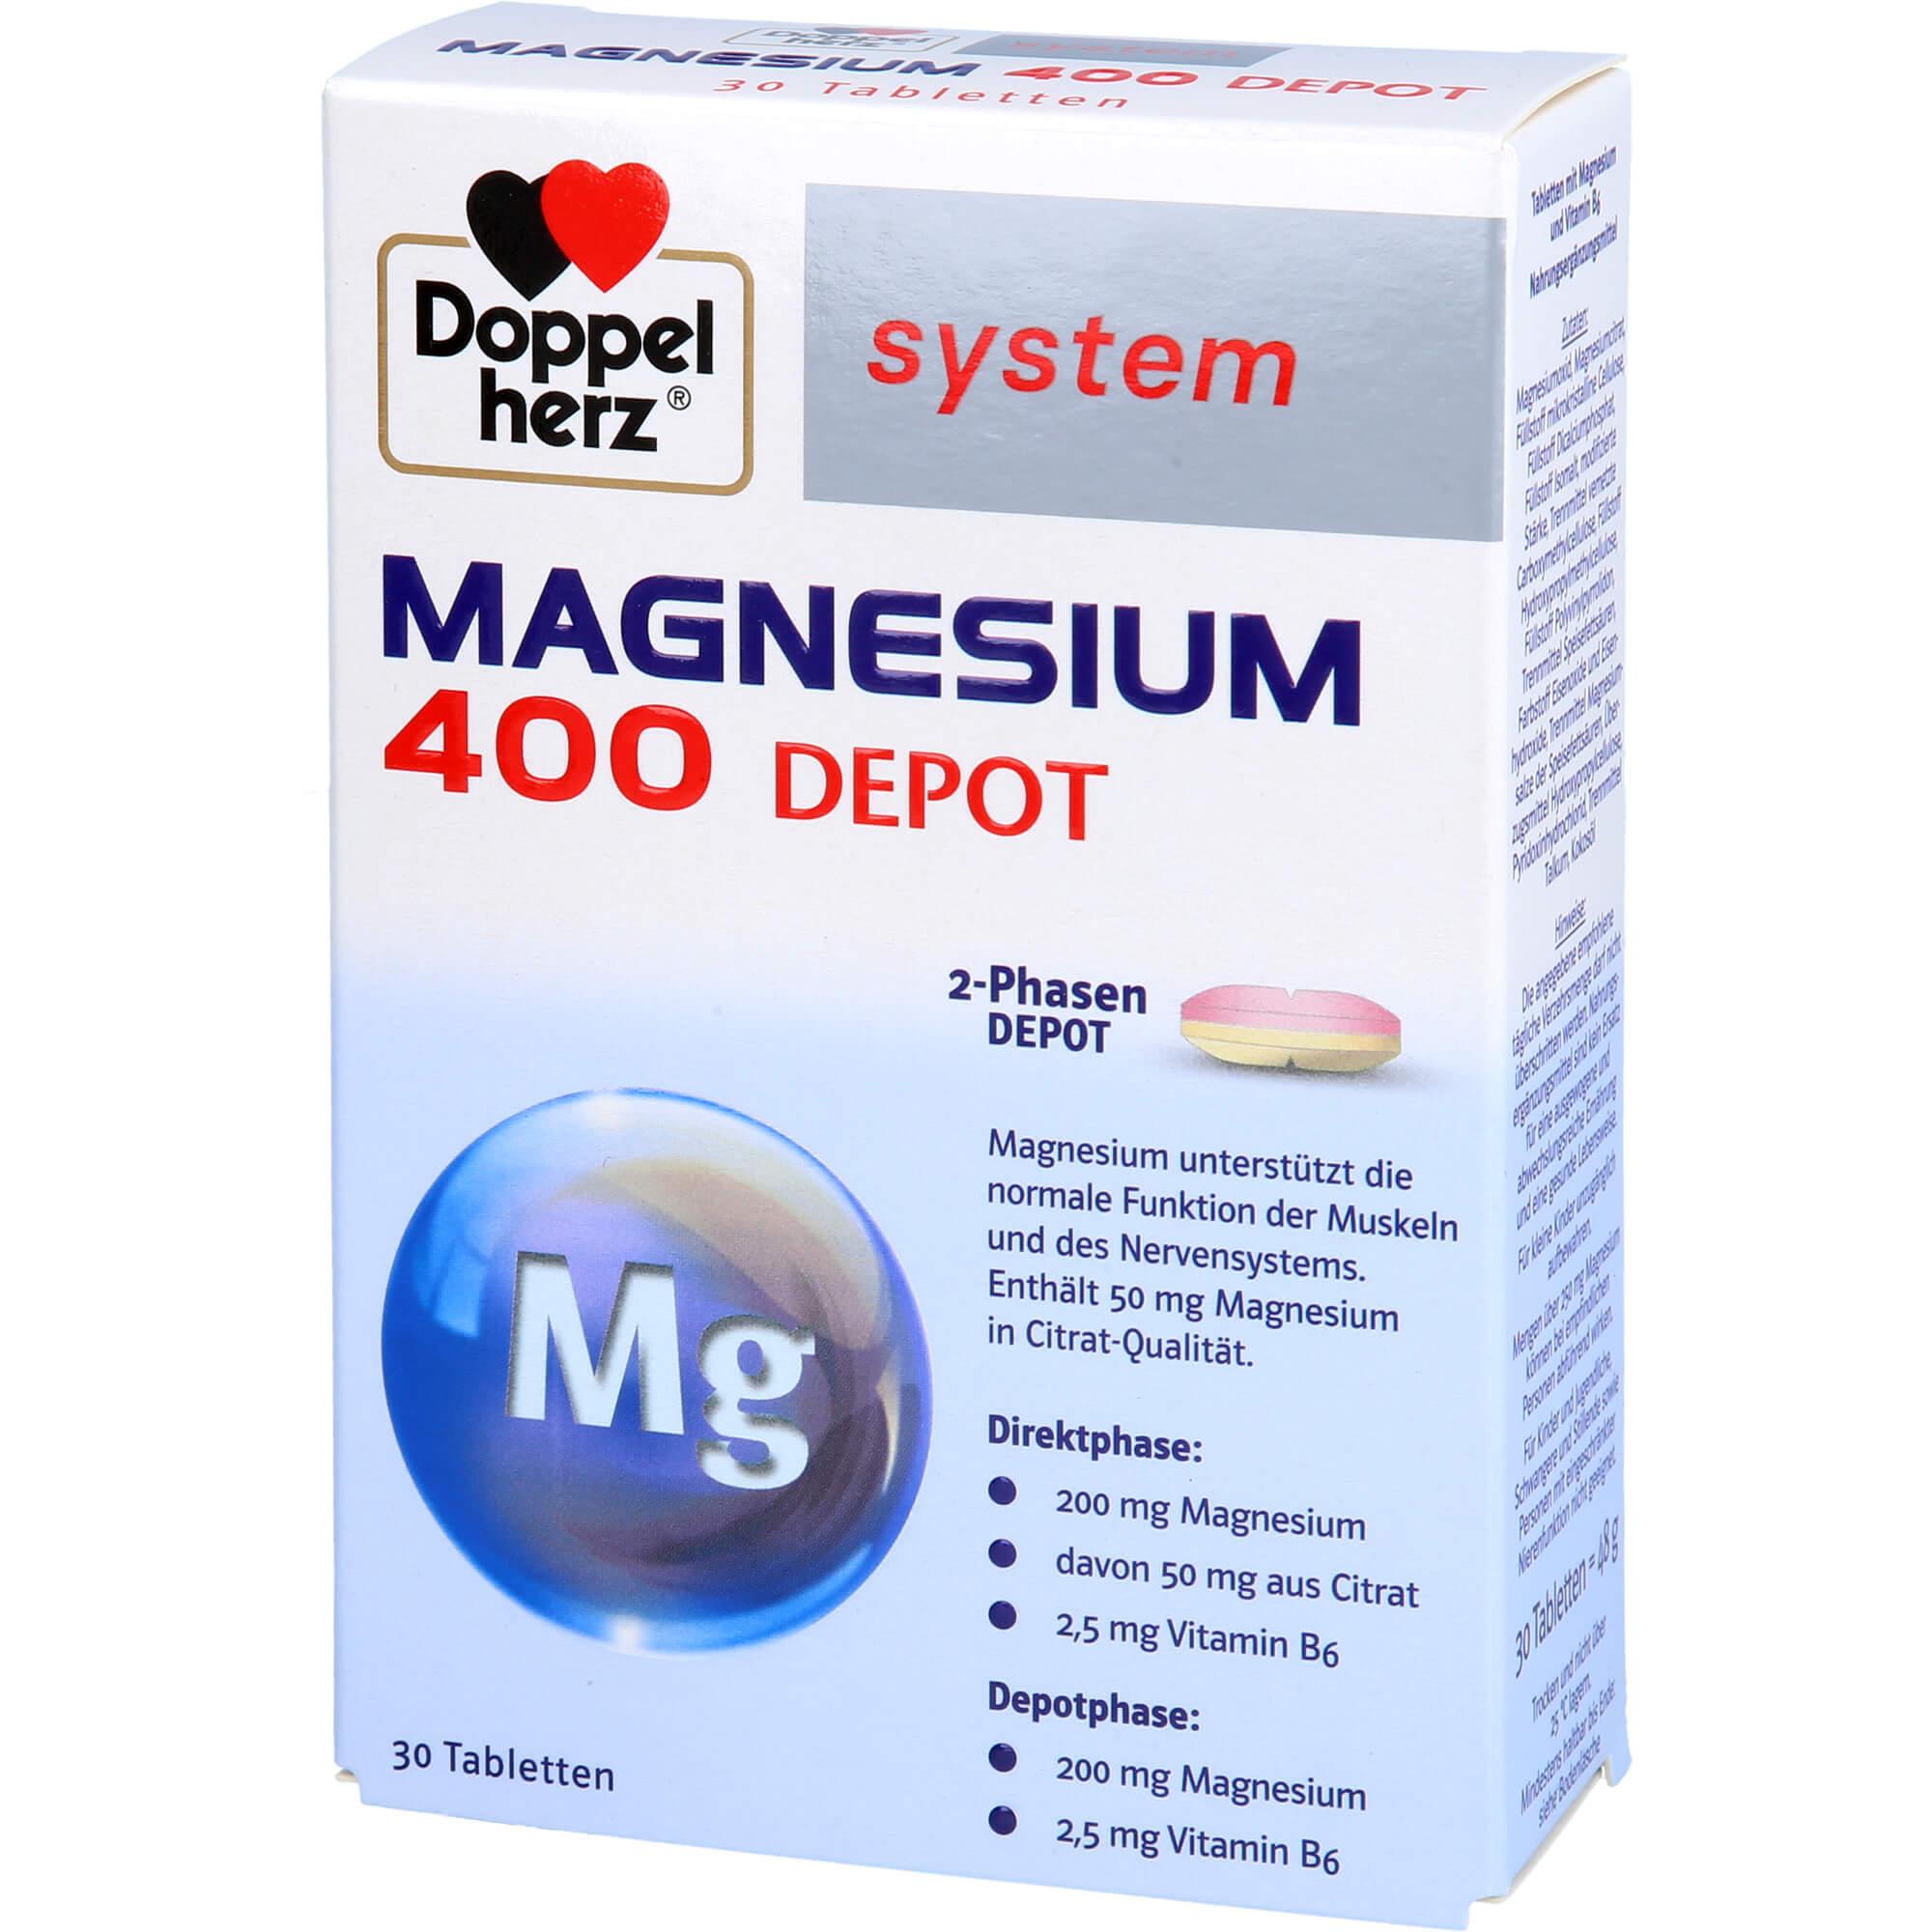 DOPPELHERZ Magnesium 400 Depot system Tabletten